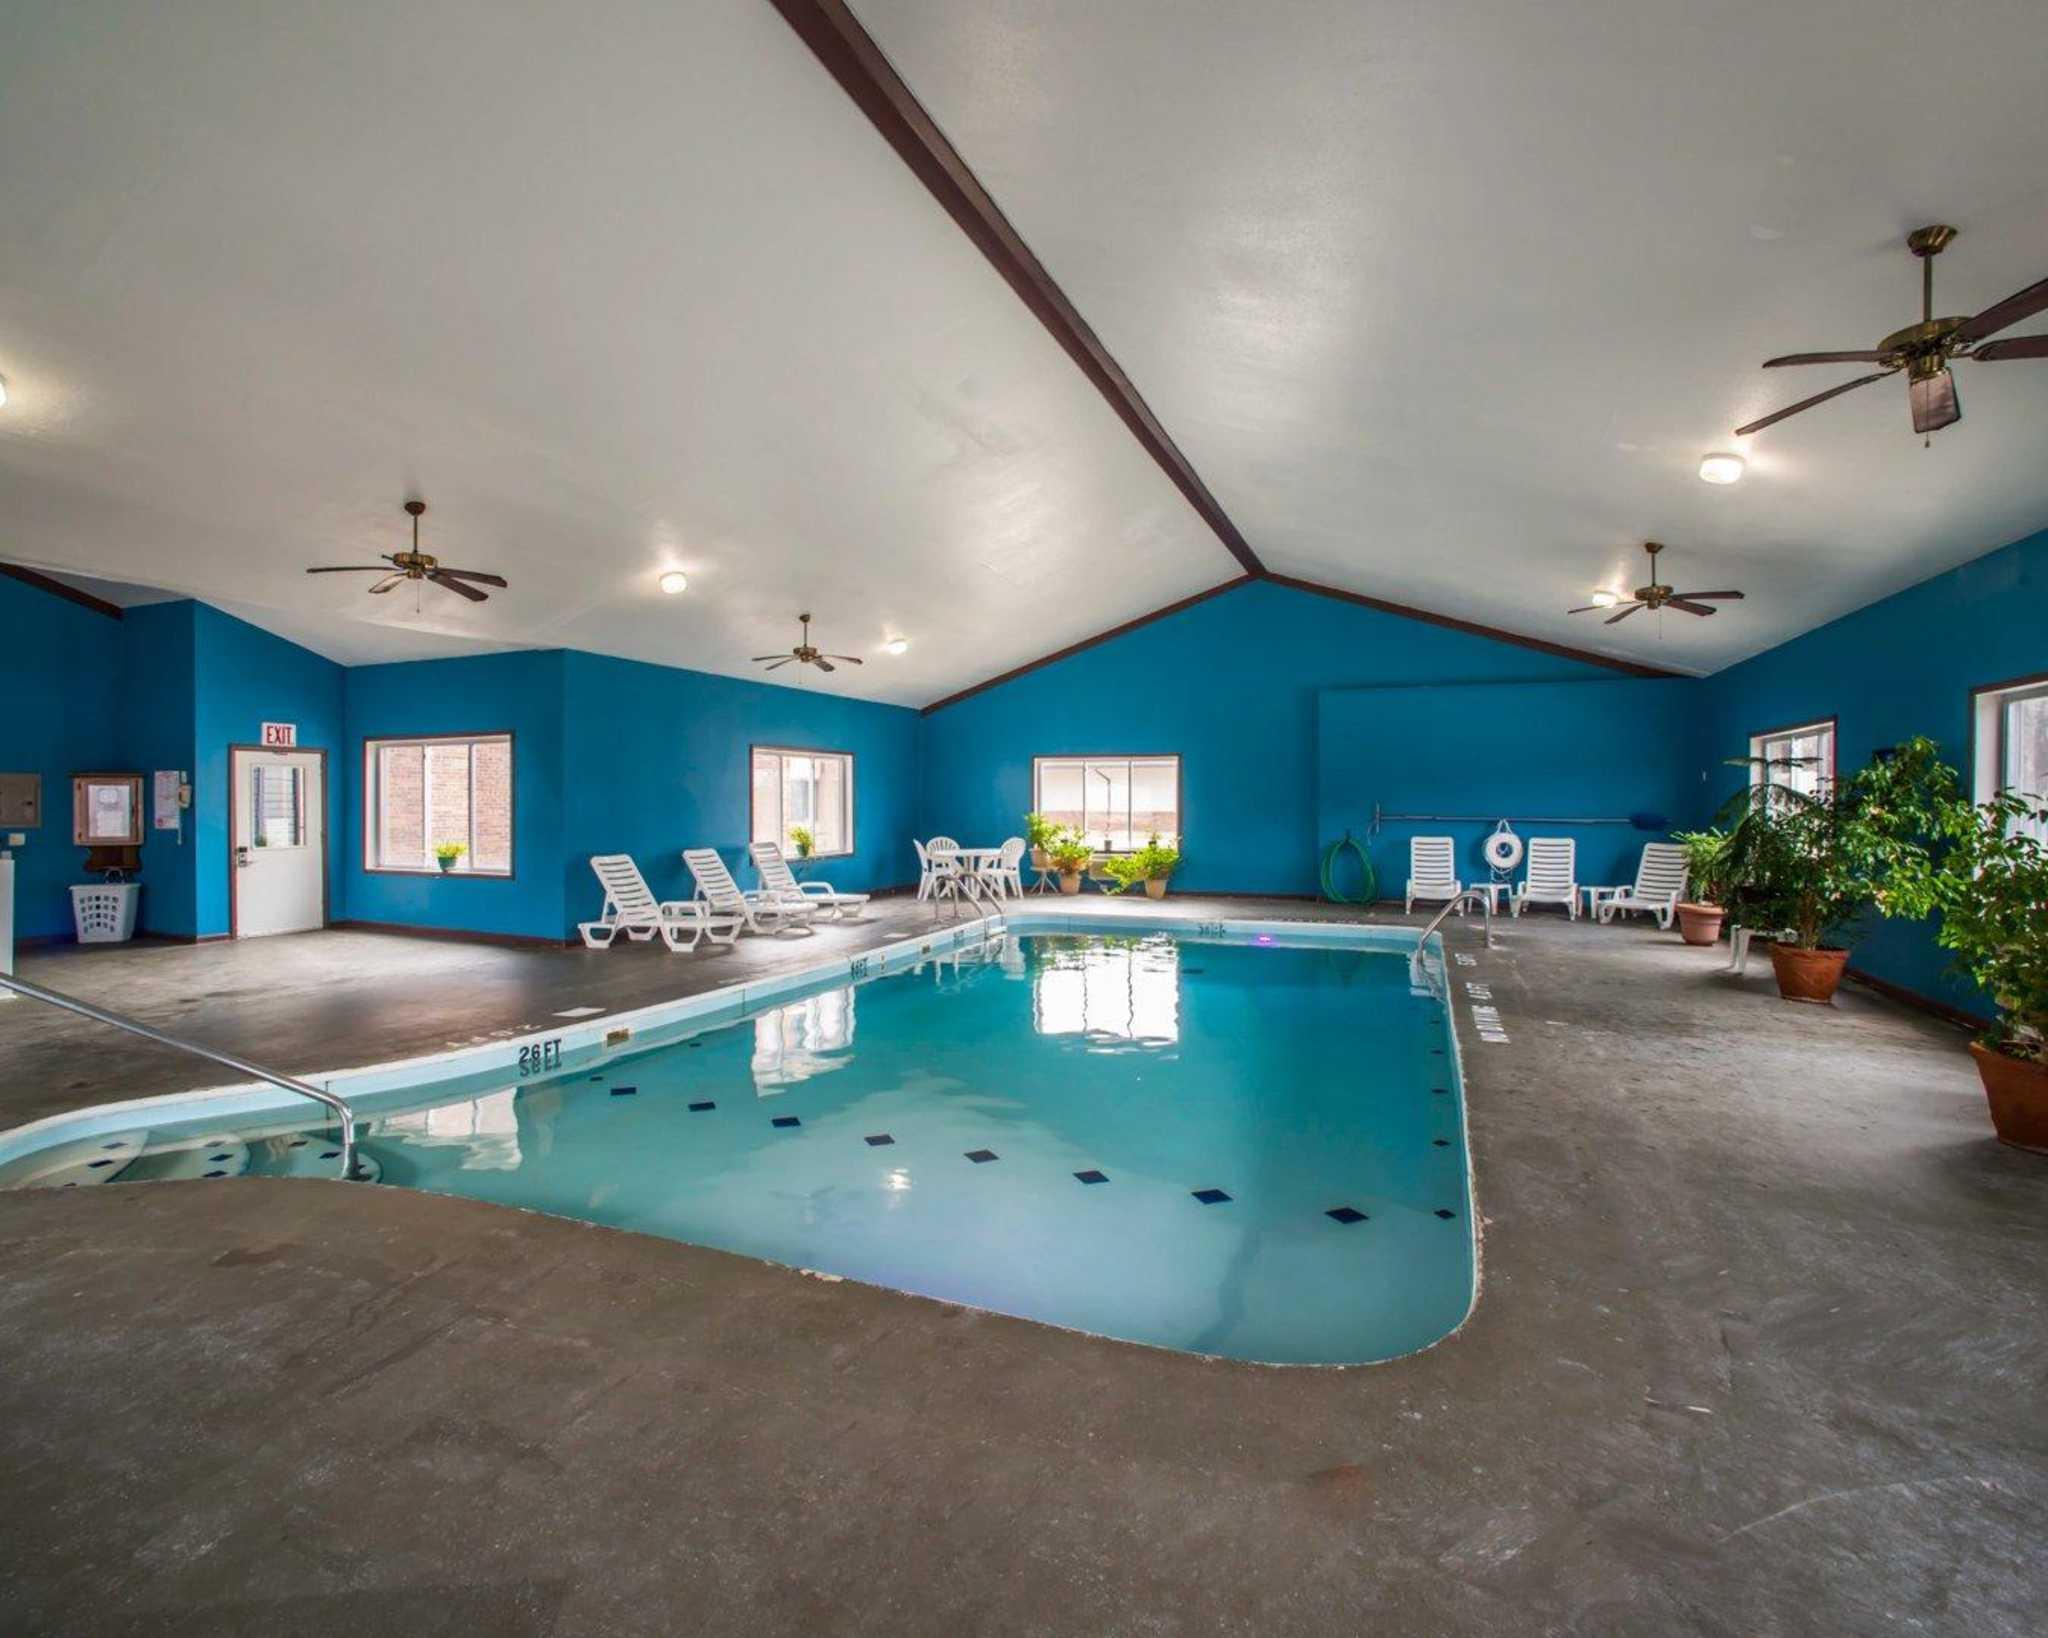 Econo Lodge Inn & Suites image 35